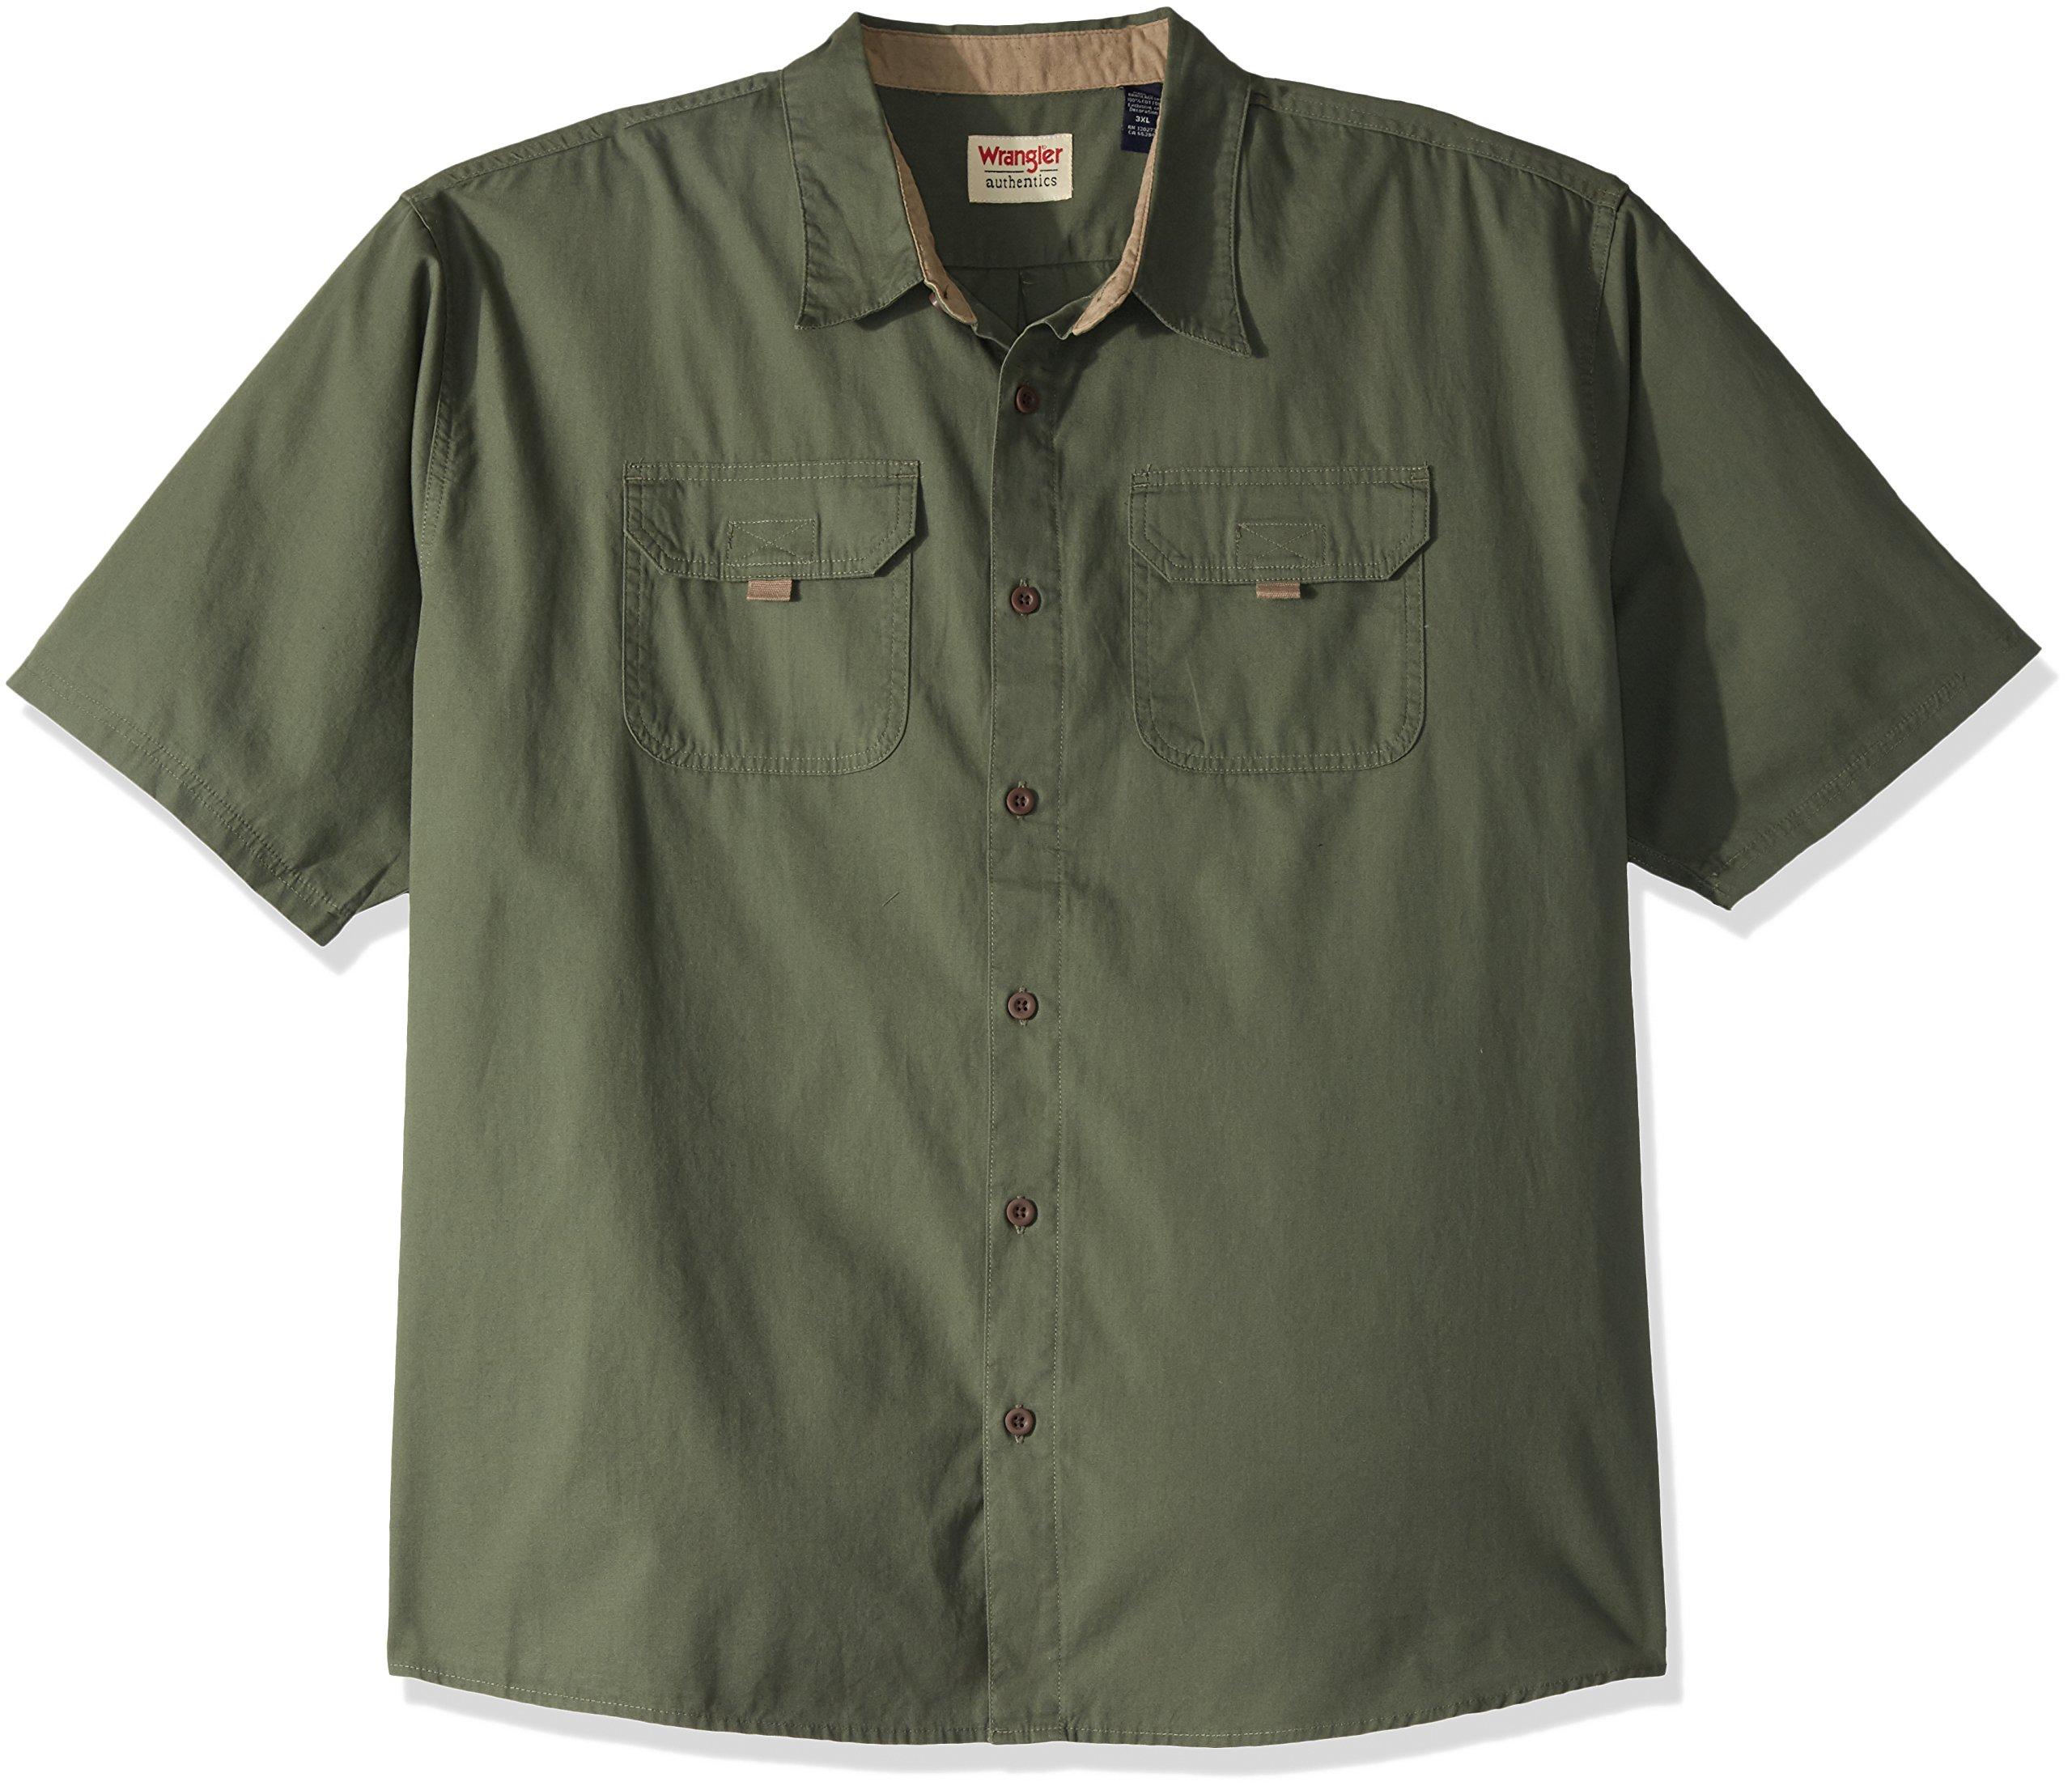 Wrangler Authentics Men's Big and Tall Authentics Short Sleeve Canvas Shirt, Beetle, 3XL